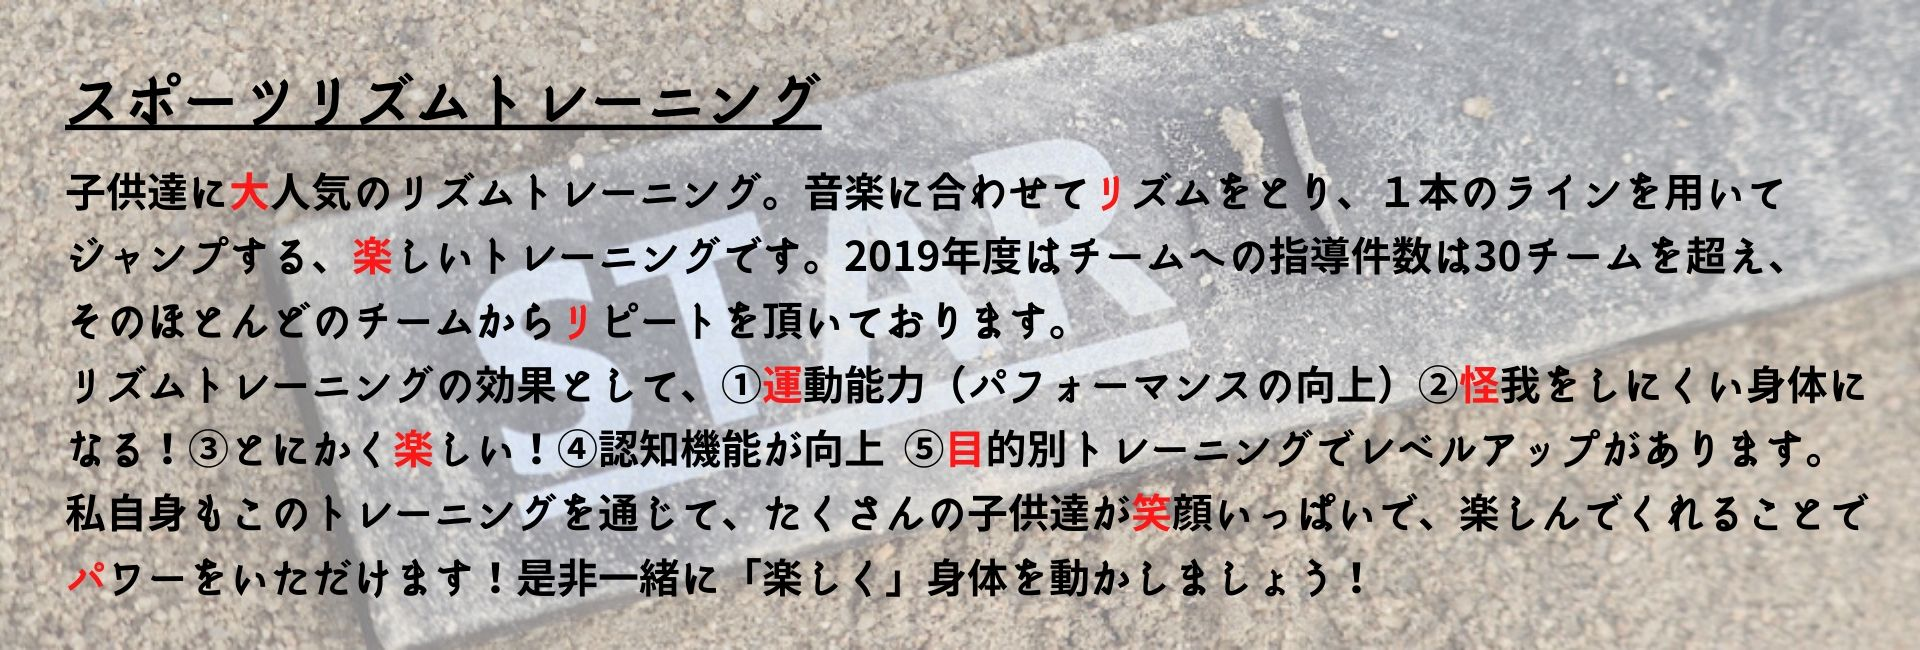 STAR スポーツリズムトレーニング 京都